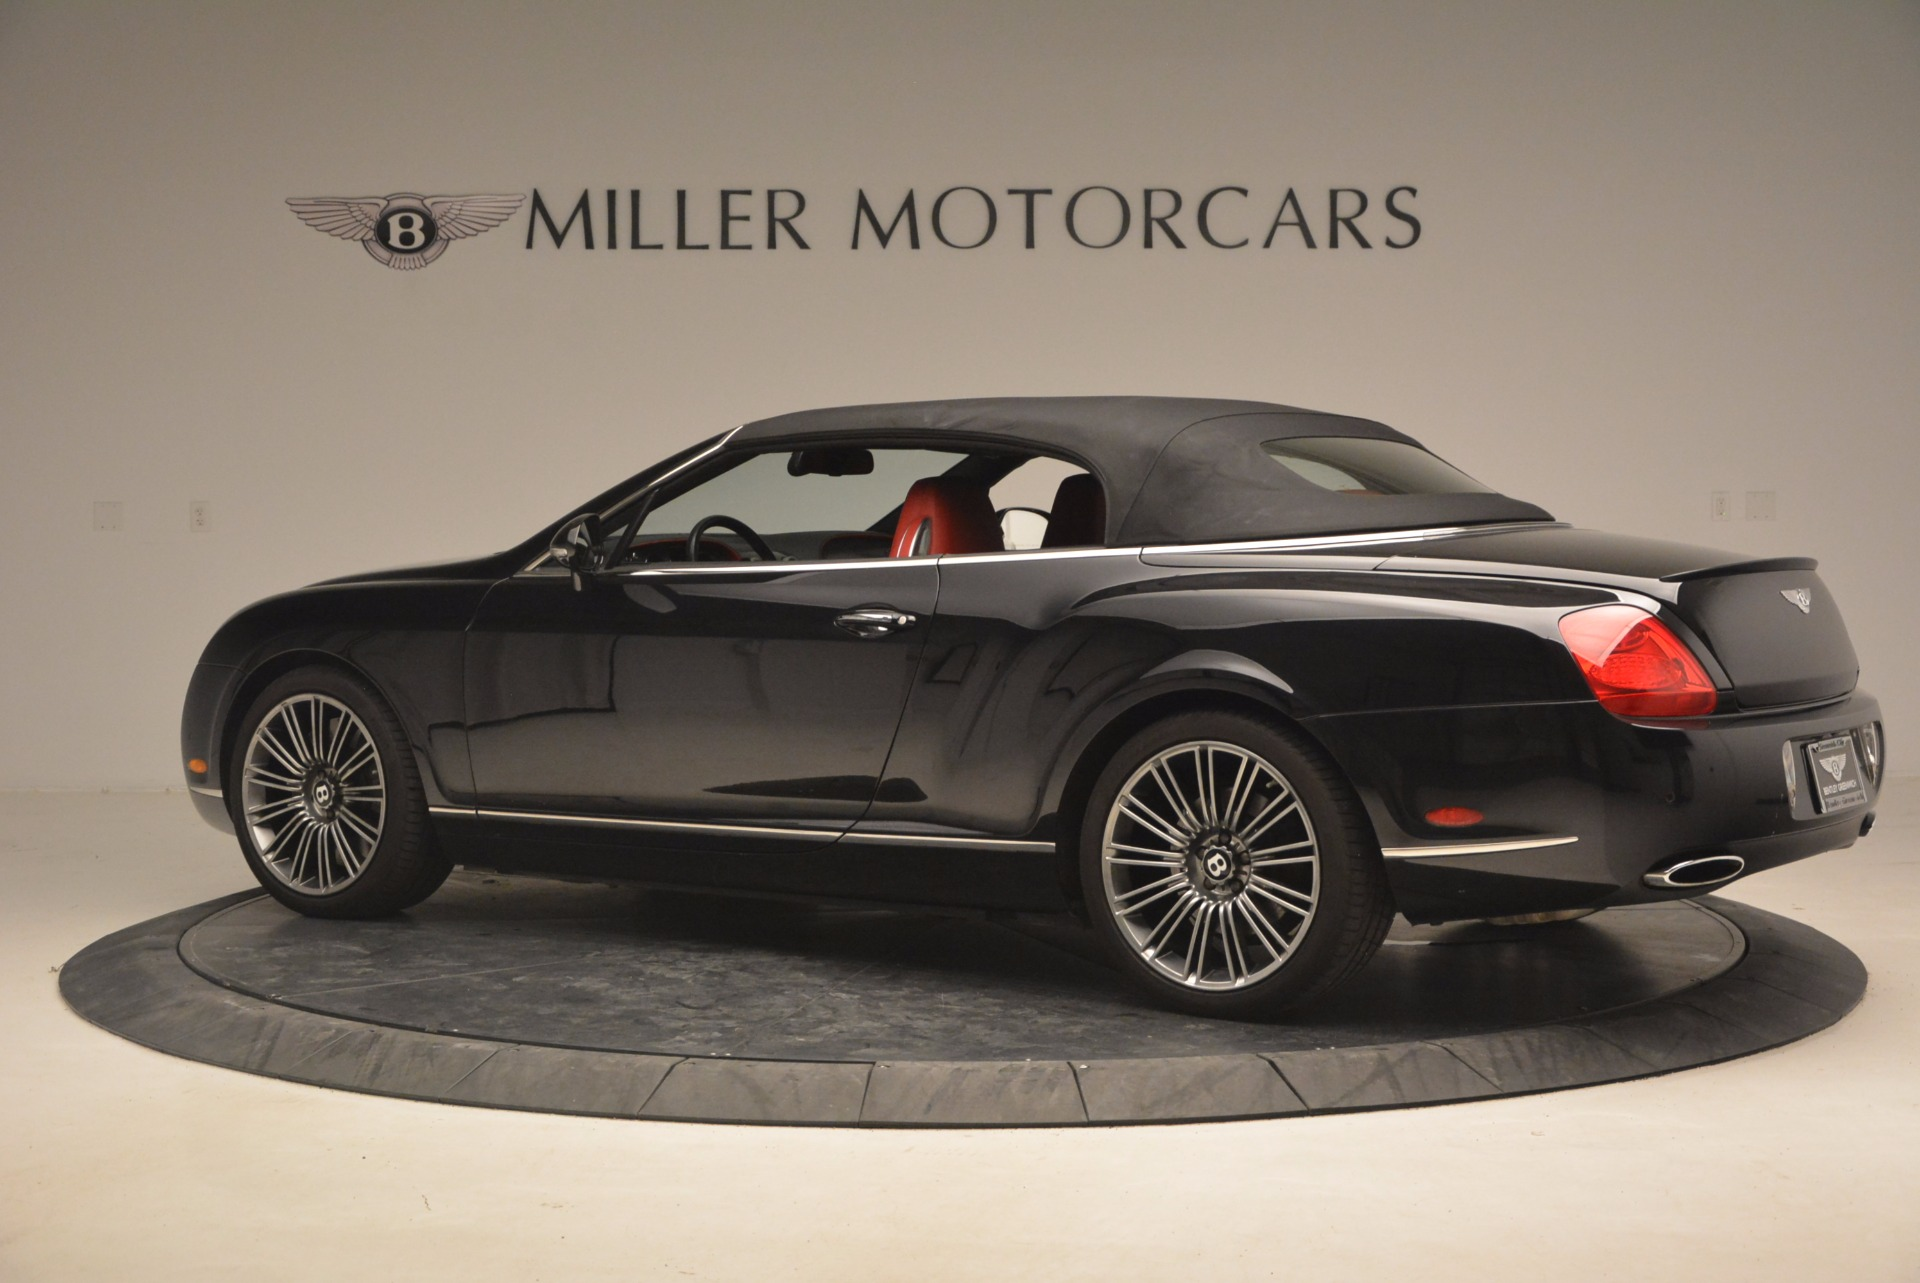 Used 2010 Bentley Continental GT Speed For Sale In Westport, CT 1298_p17